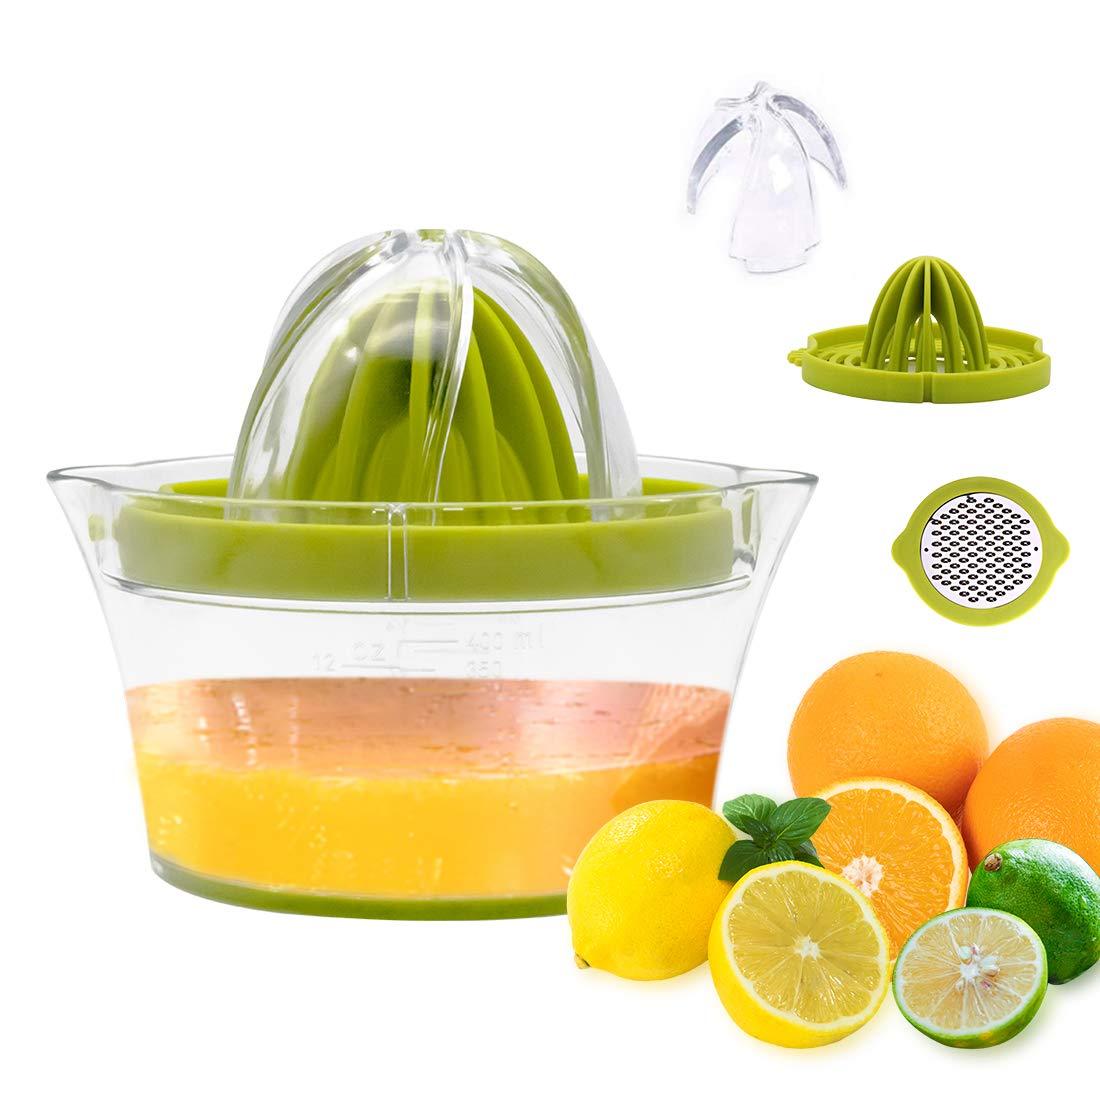 Multifunctional Citrus Juicer Manual Lemon Squeezer with Container 400ml Lemon Orange Squeezer Dishwasher Safe Plastic Anti-drip Filter Mechanism BPA-Free